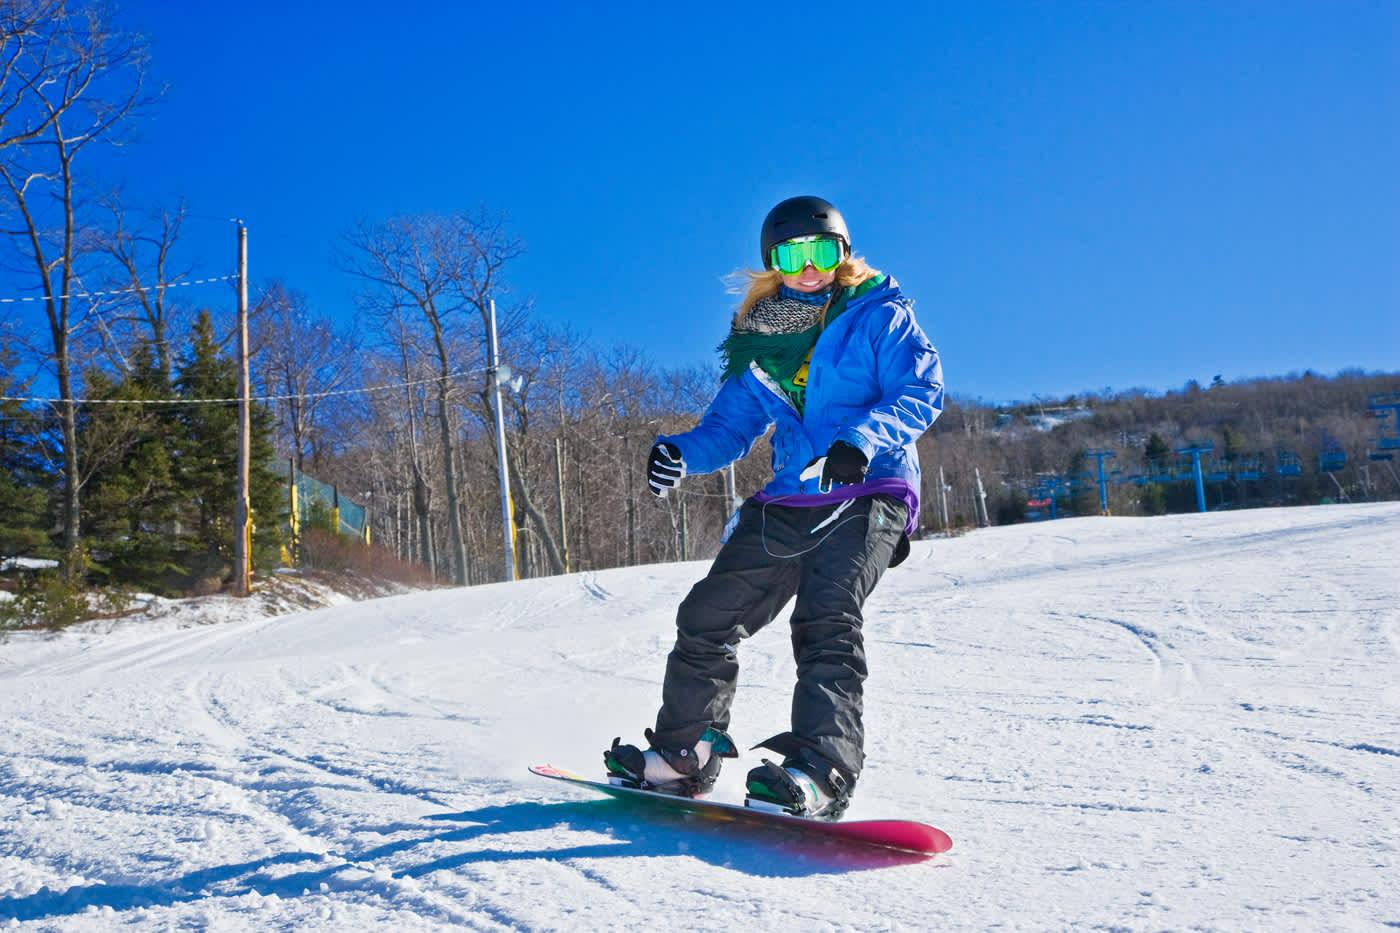 camelback mountain resort - snowboarding | tannersville, pa 18372